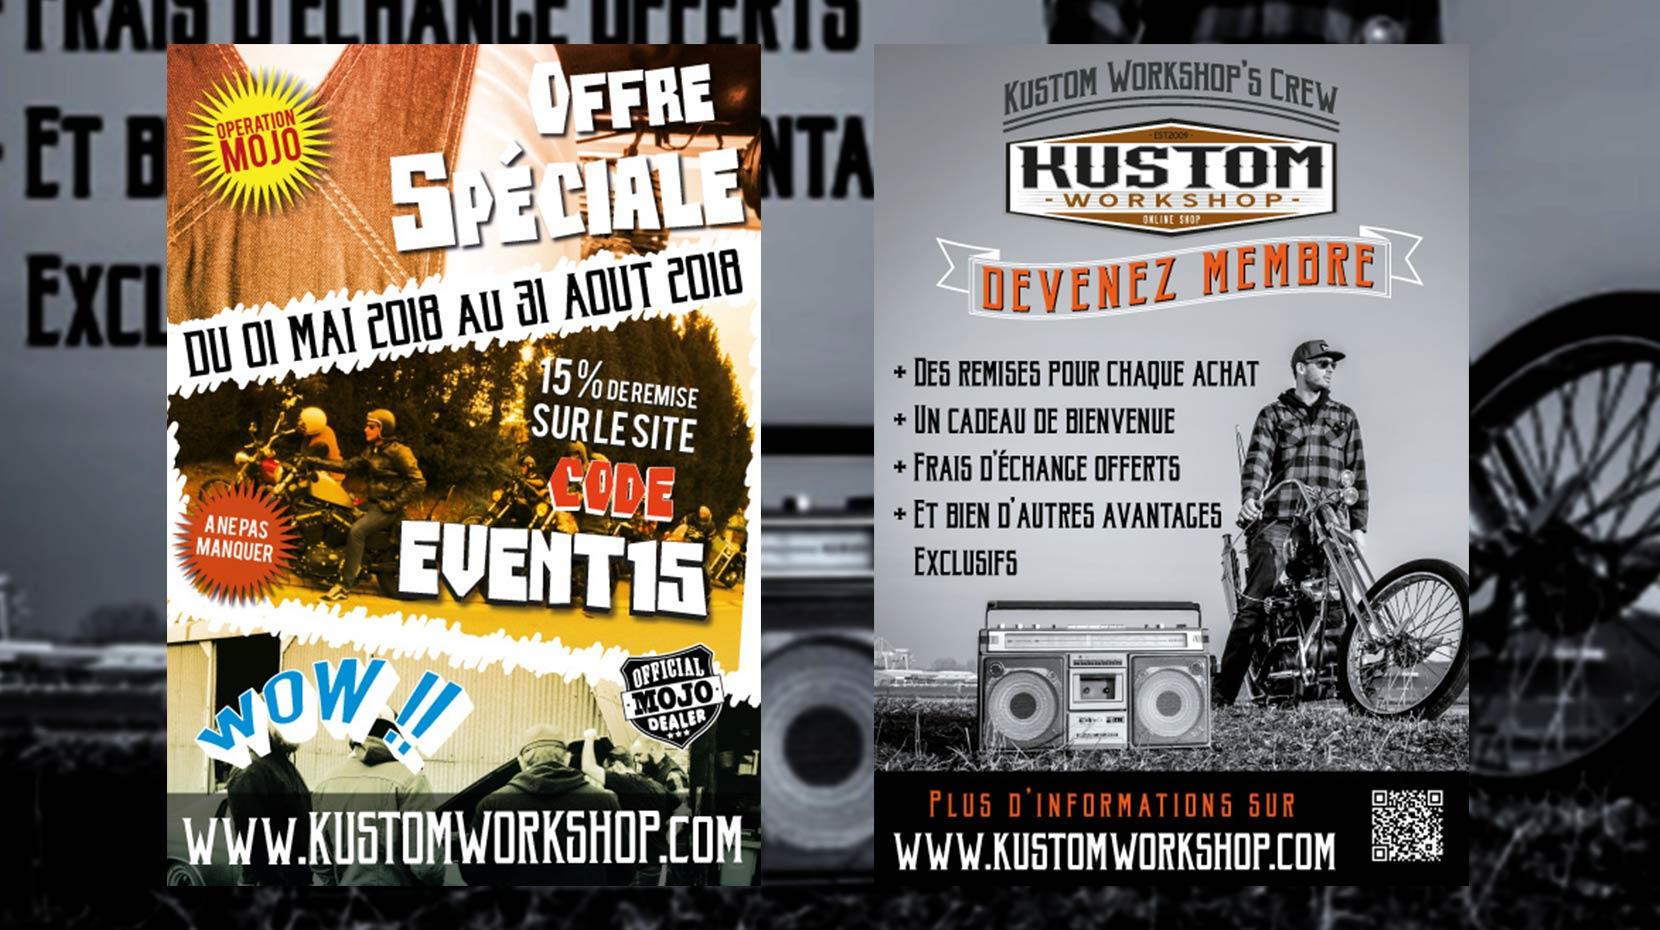 KWS 2018 event flyer